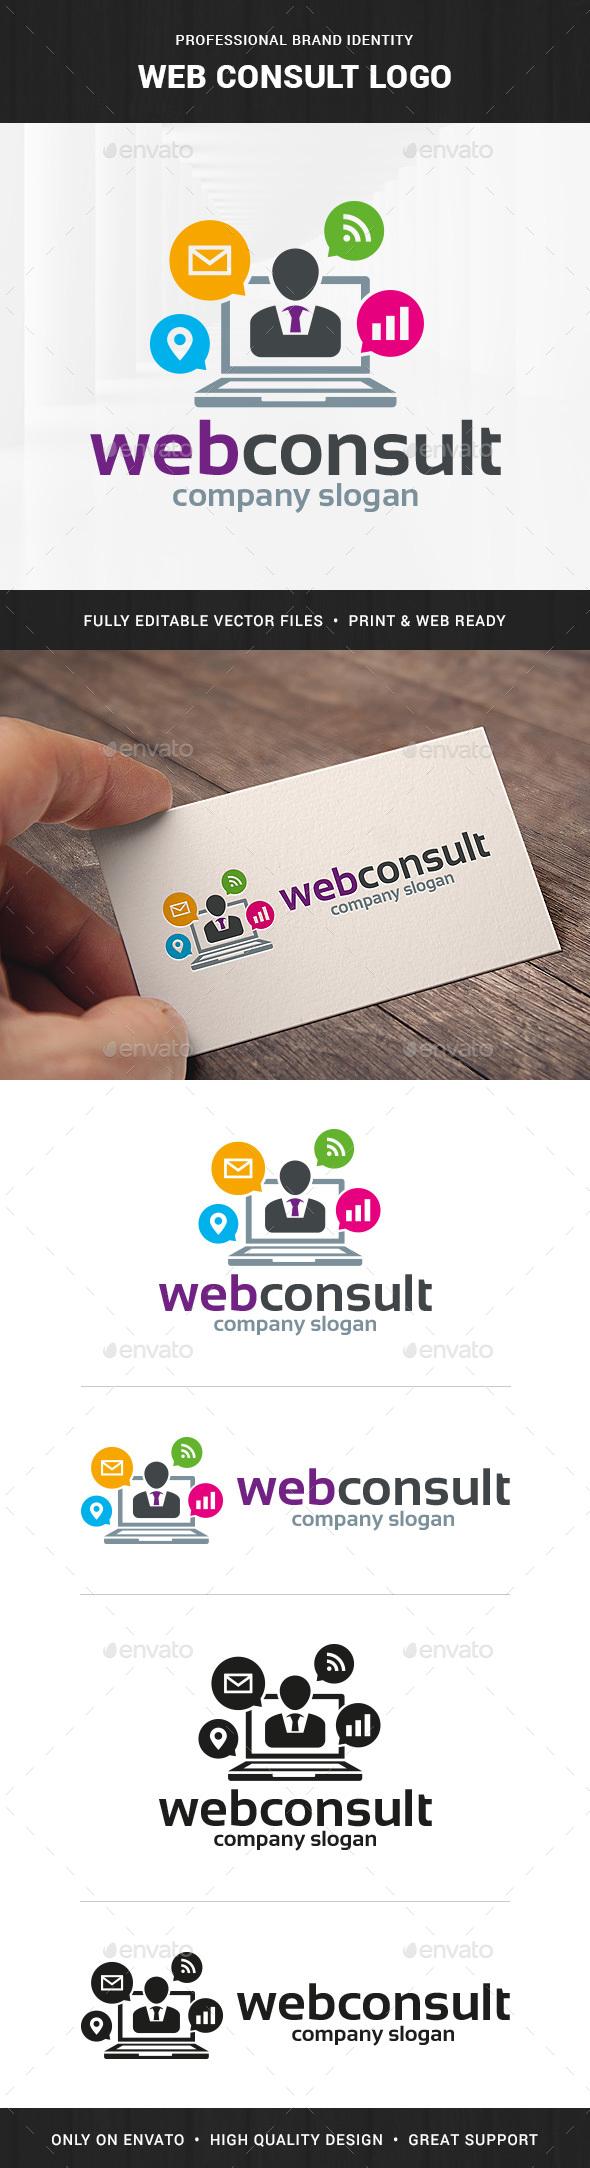 Web Consult Logo Template